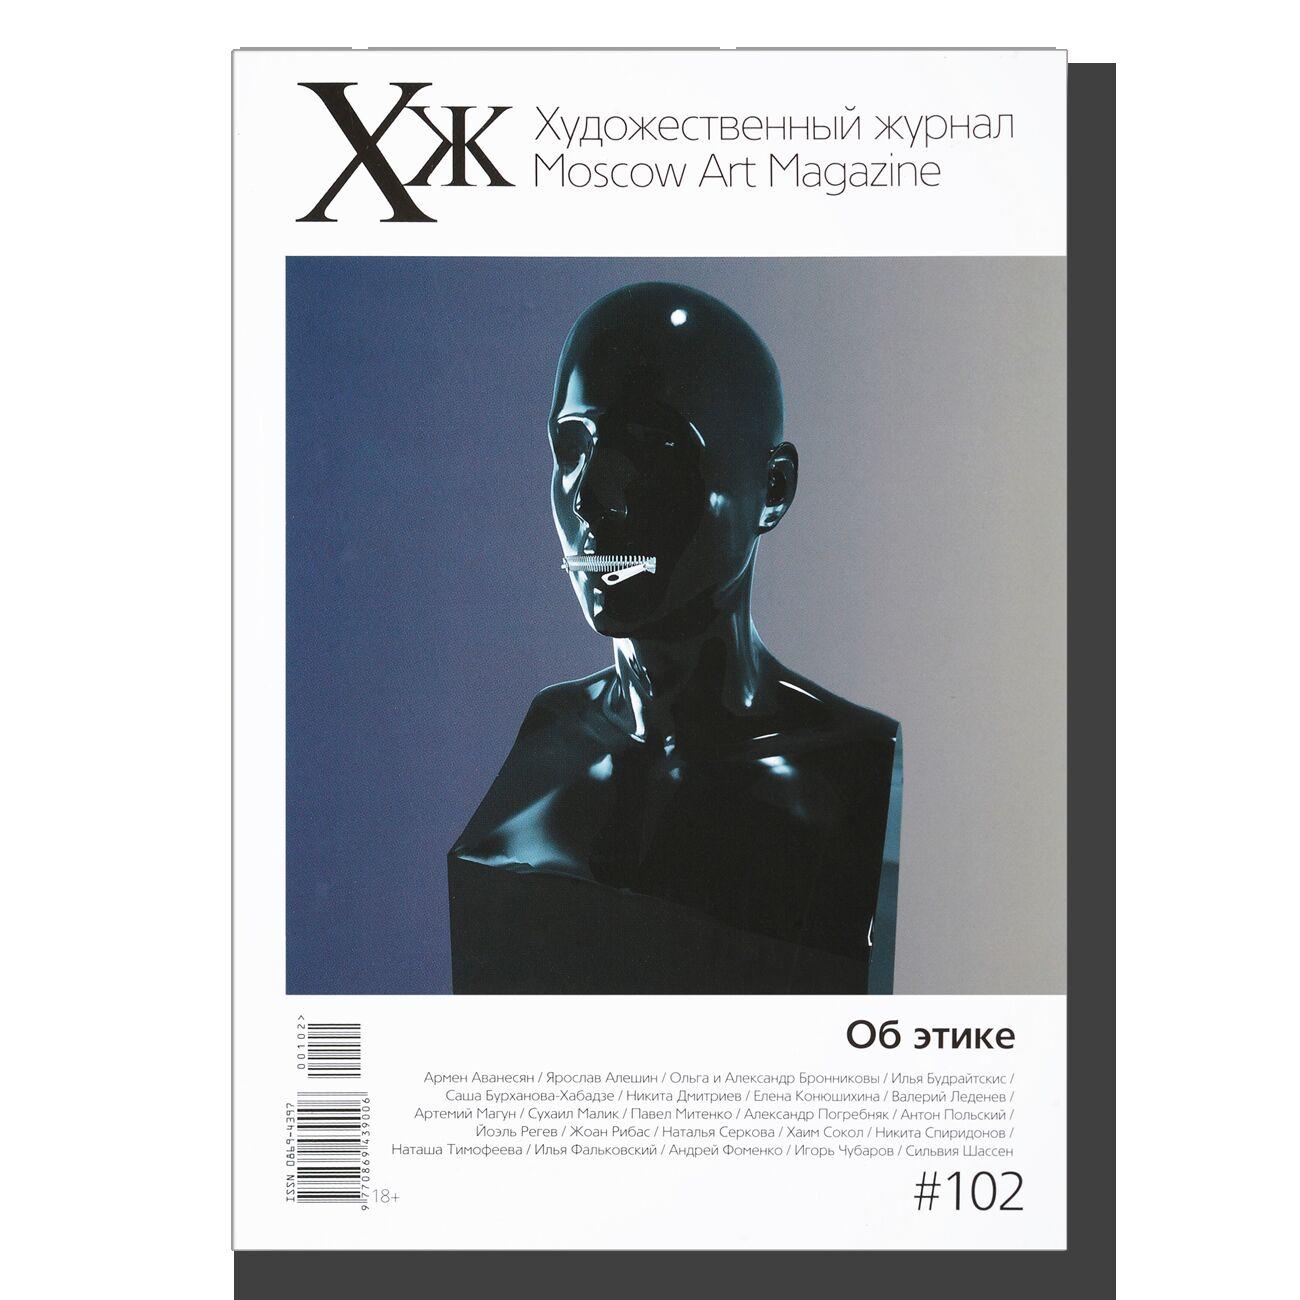 Moscow Art Magazine No 102